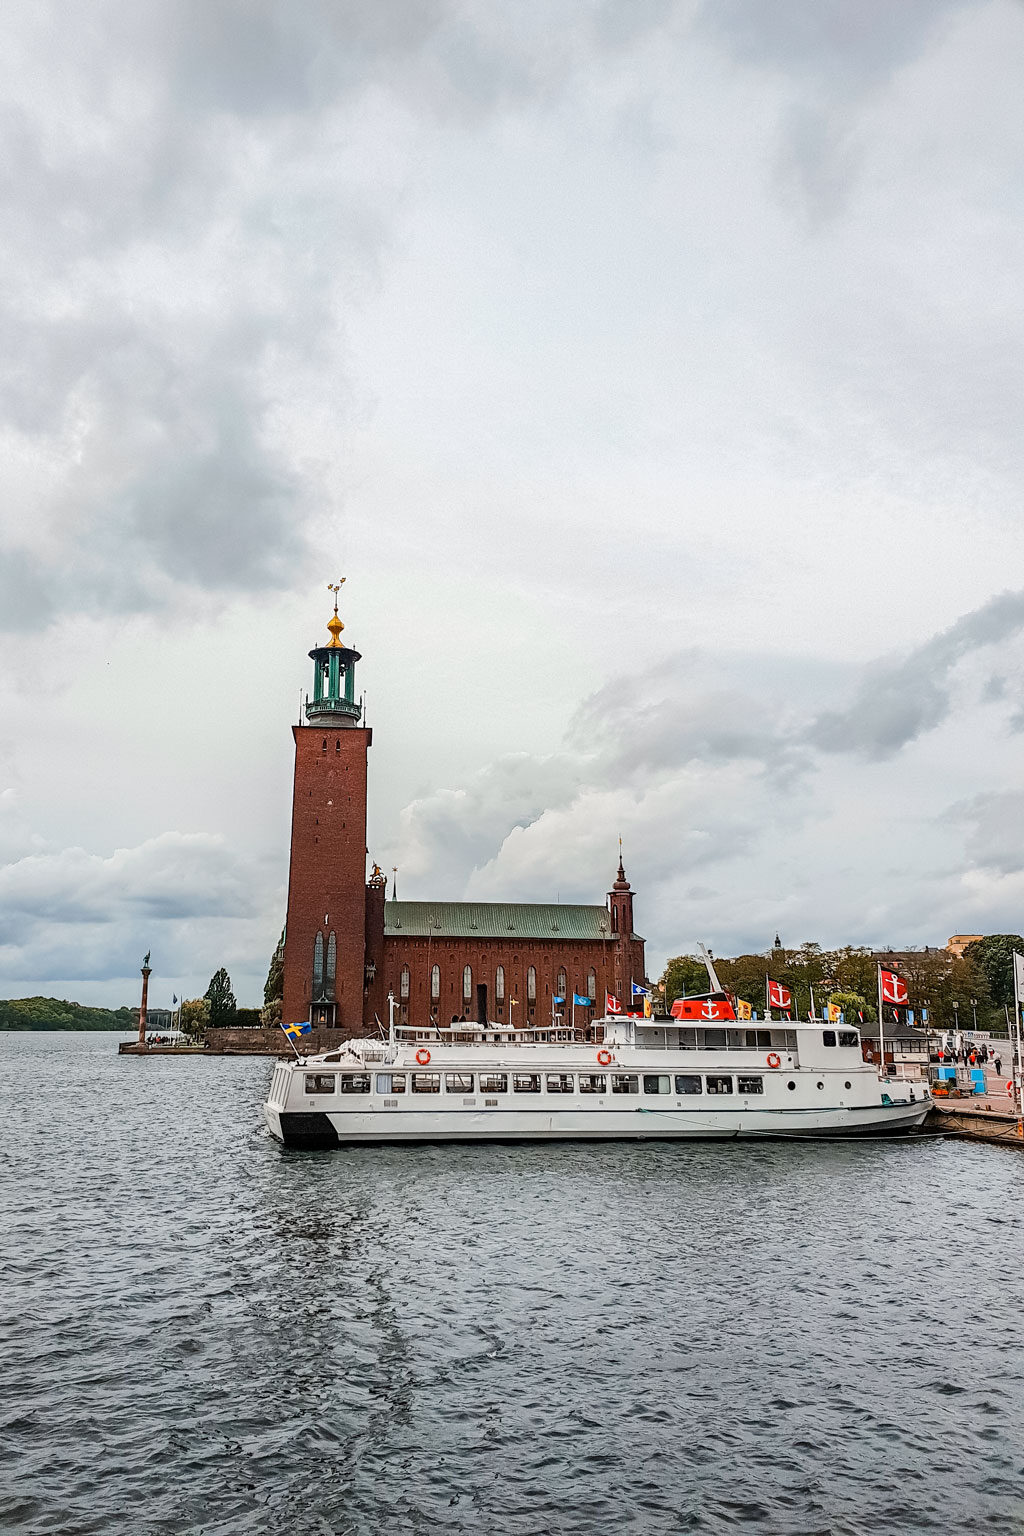 Klara Malarstrand Ferry Port and Stockholm City Hall